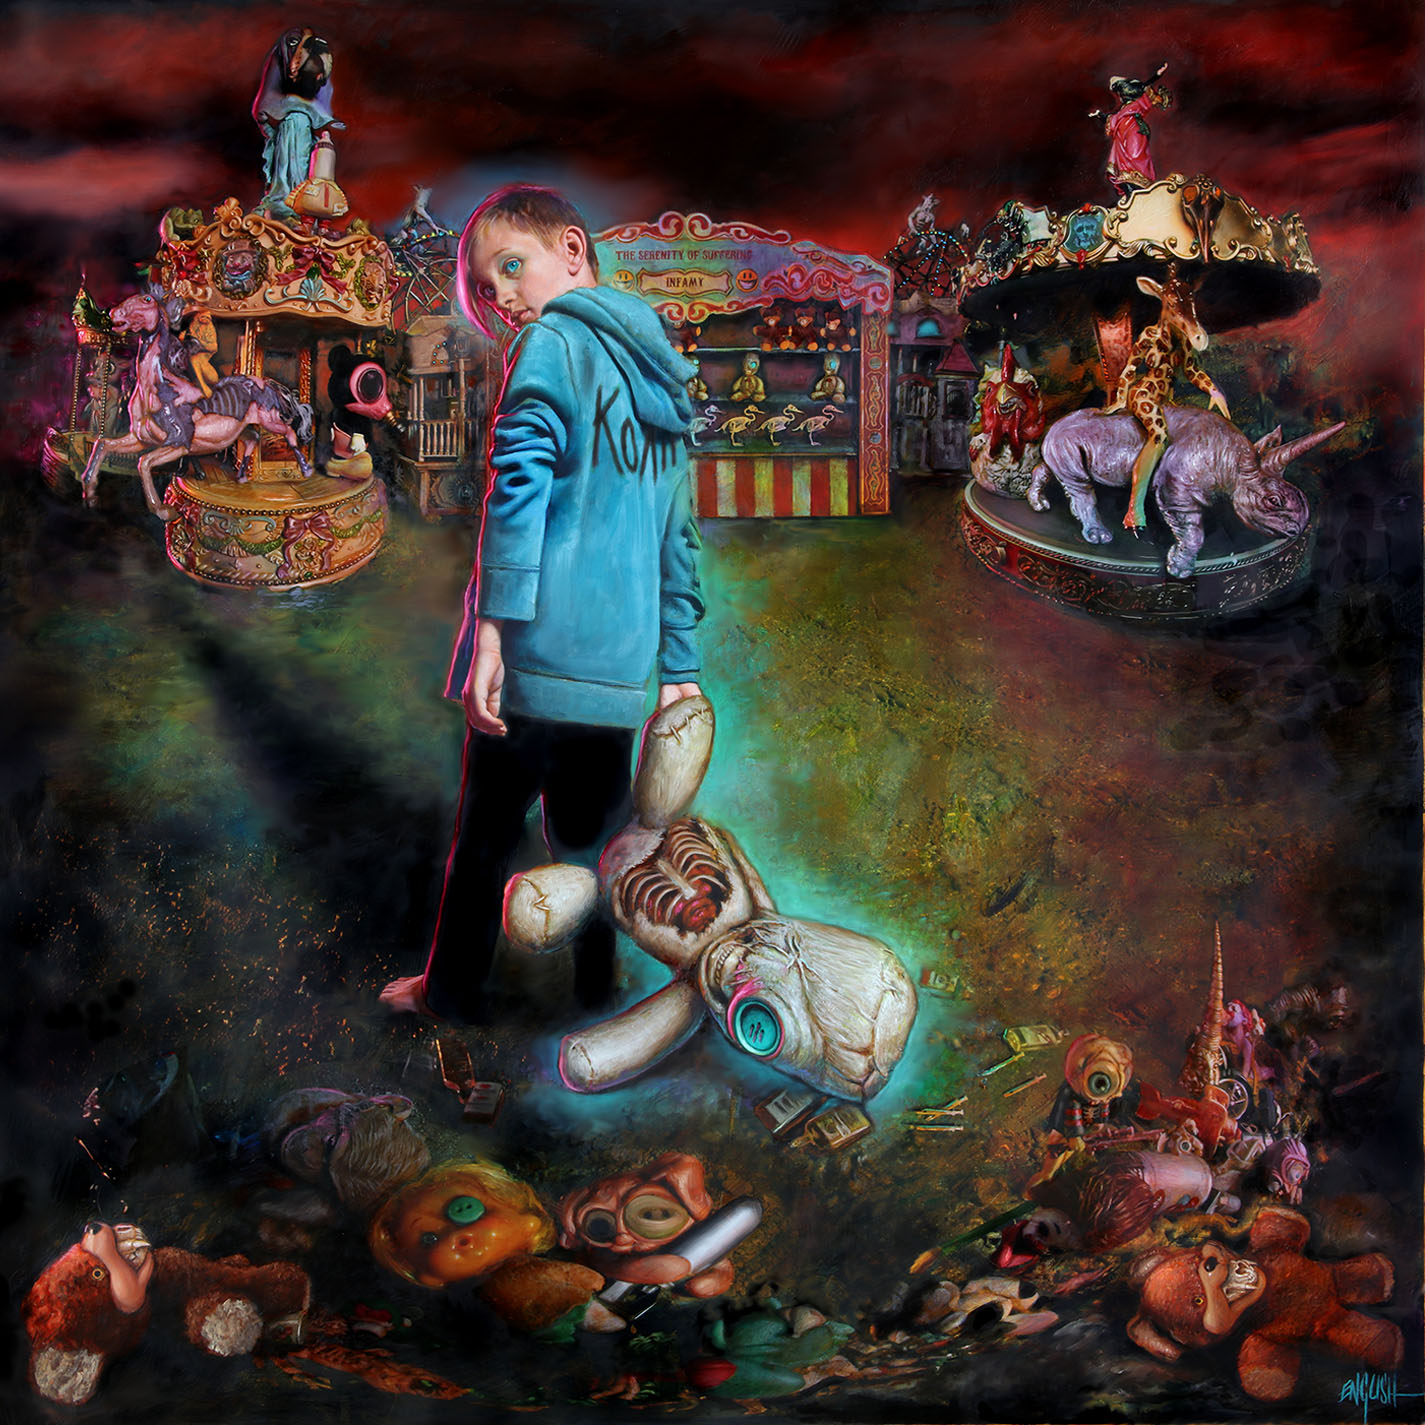 KORN reveal new album details & new video for 'Rotting In Vain'